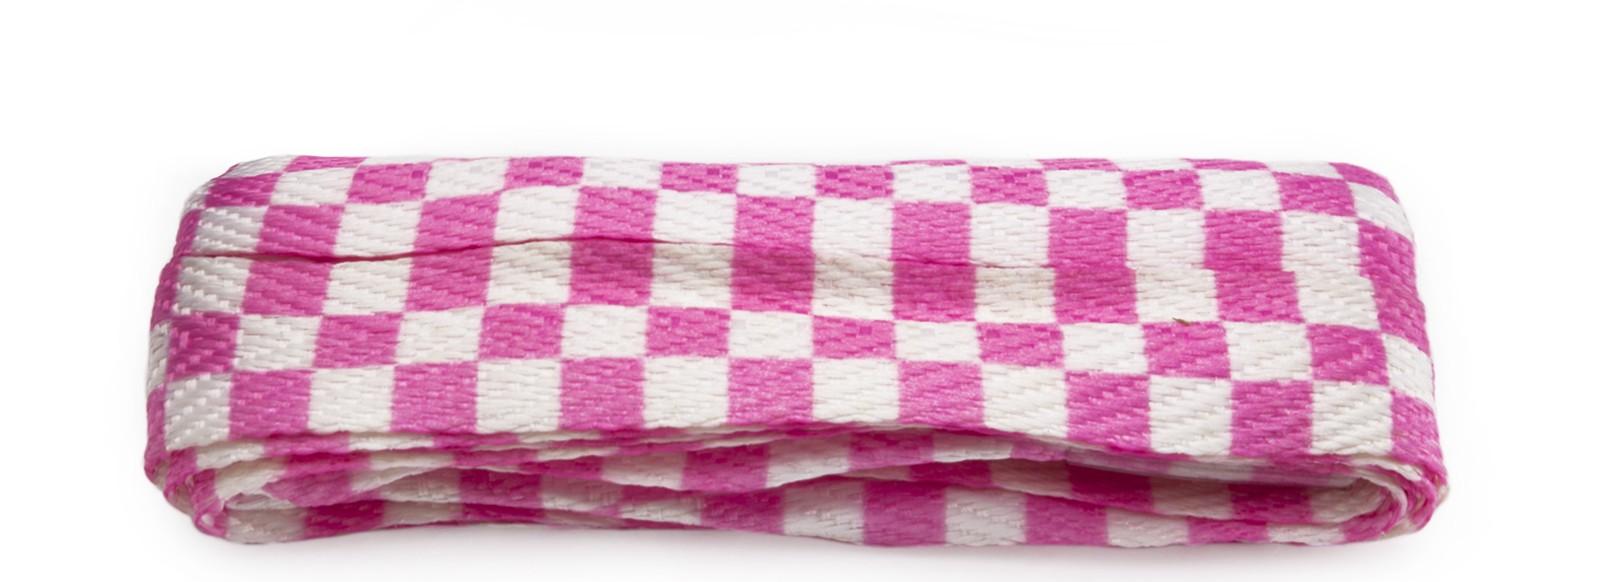 Sneaker Pink/white Checkerboard Wide